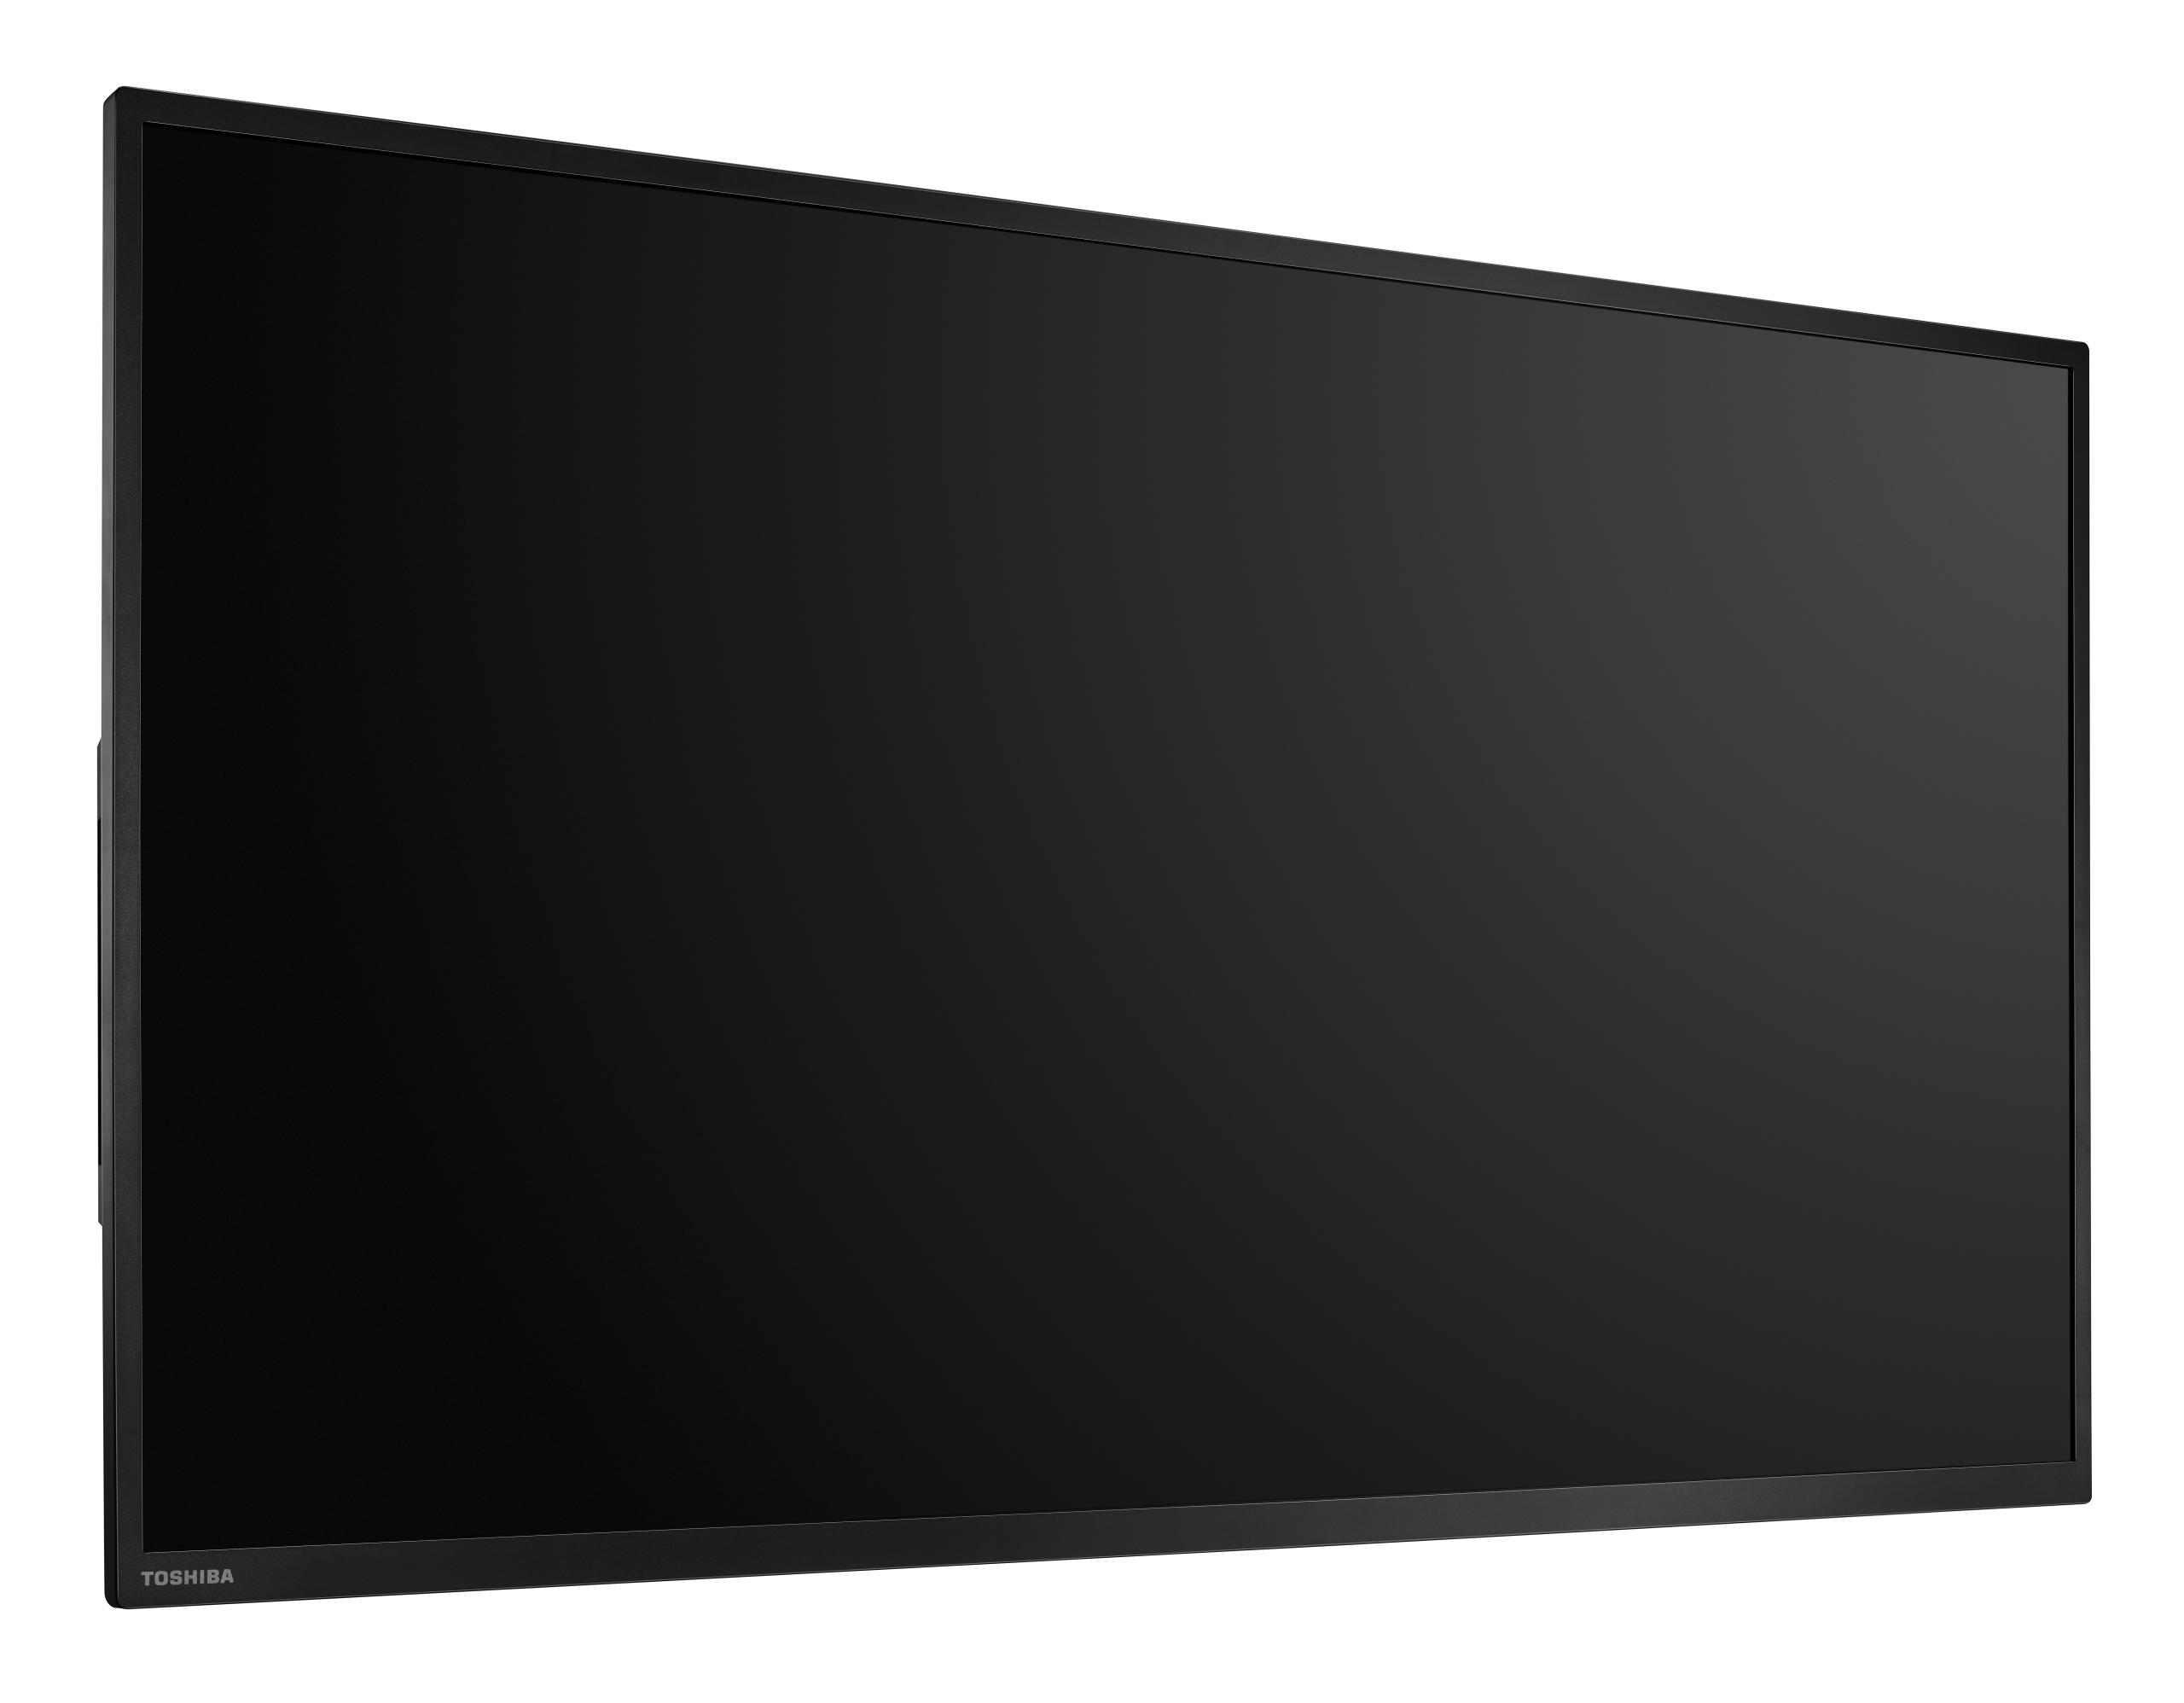 Toshiba: wielkoformatowe Ultra HD